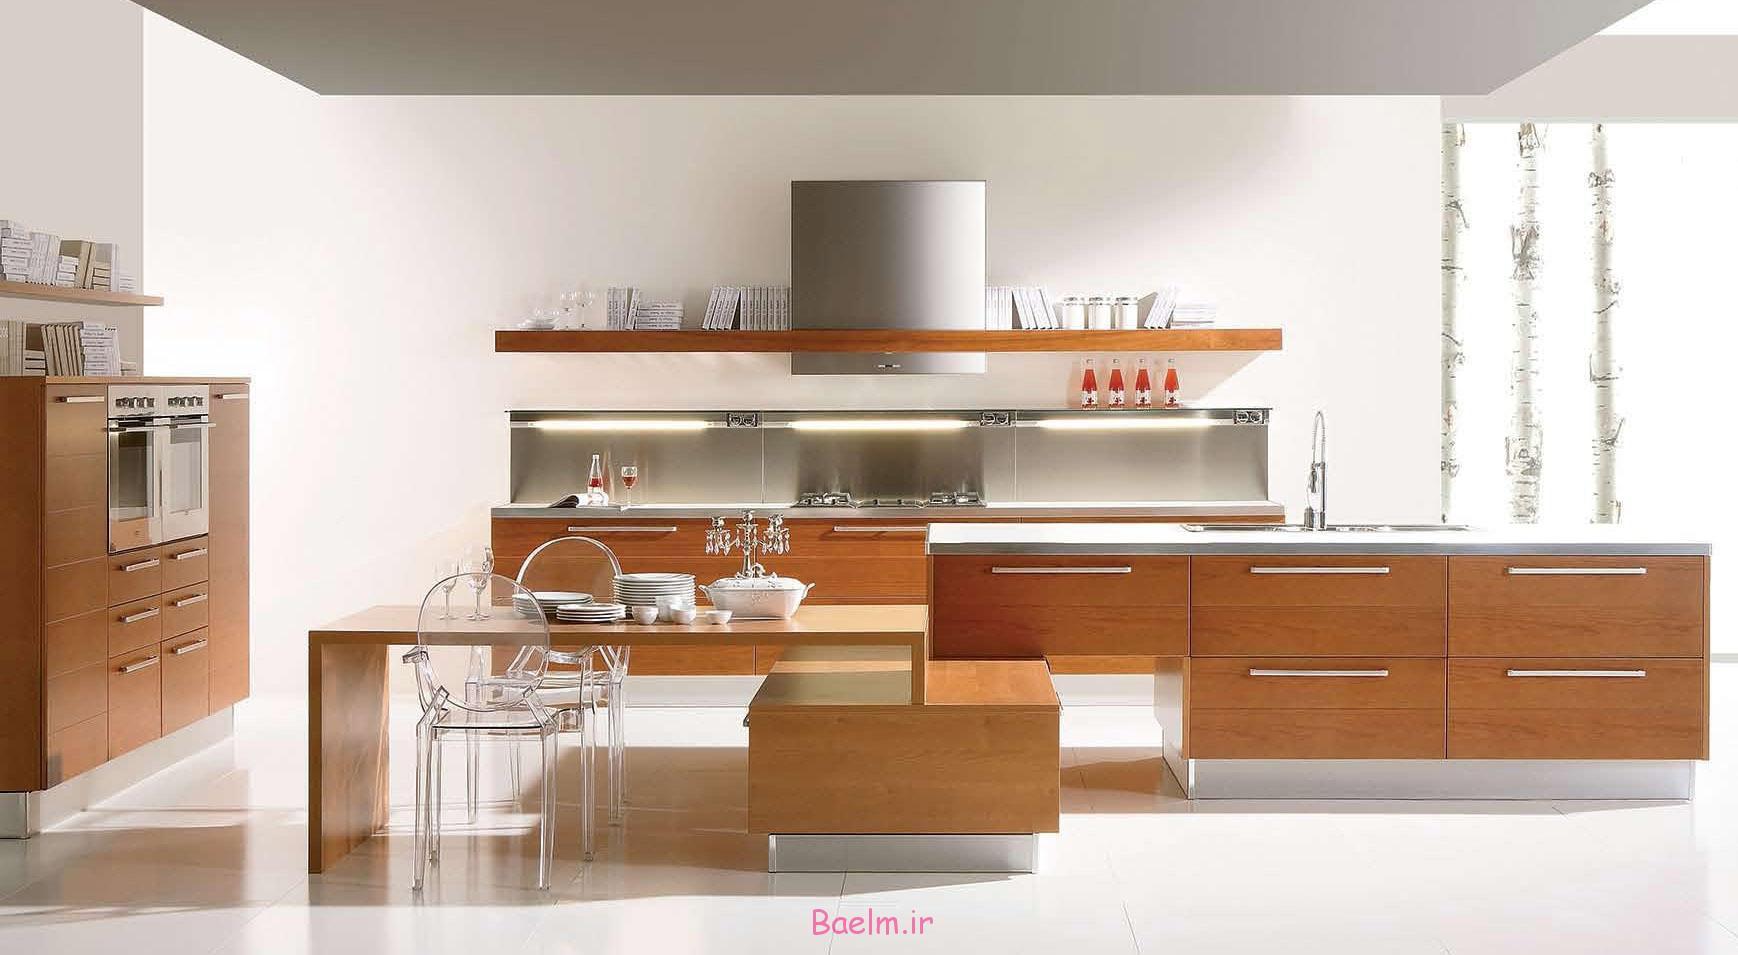 kitchen design ideas 1 Kitchen Design Ideas